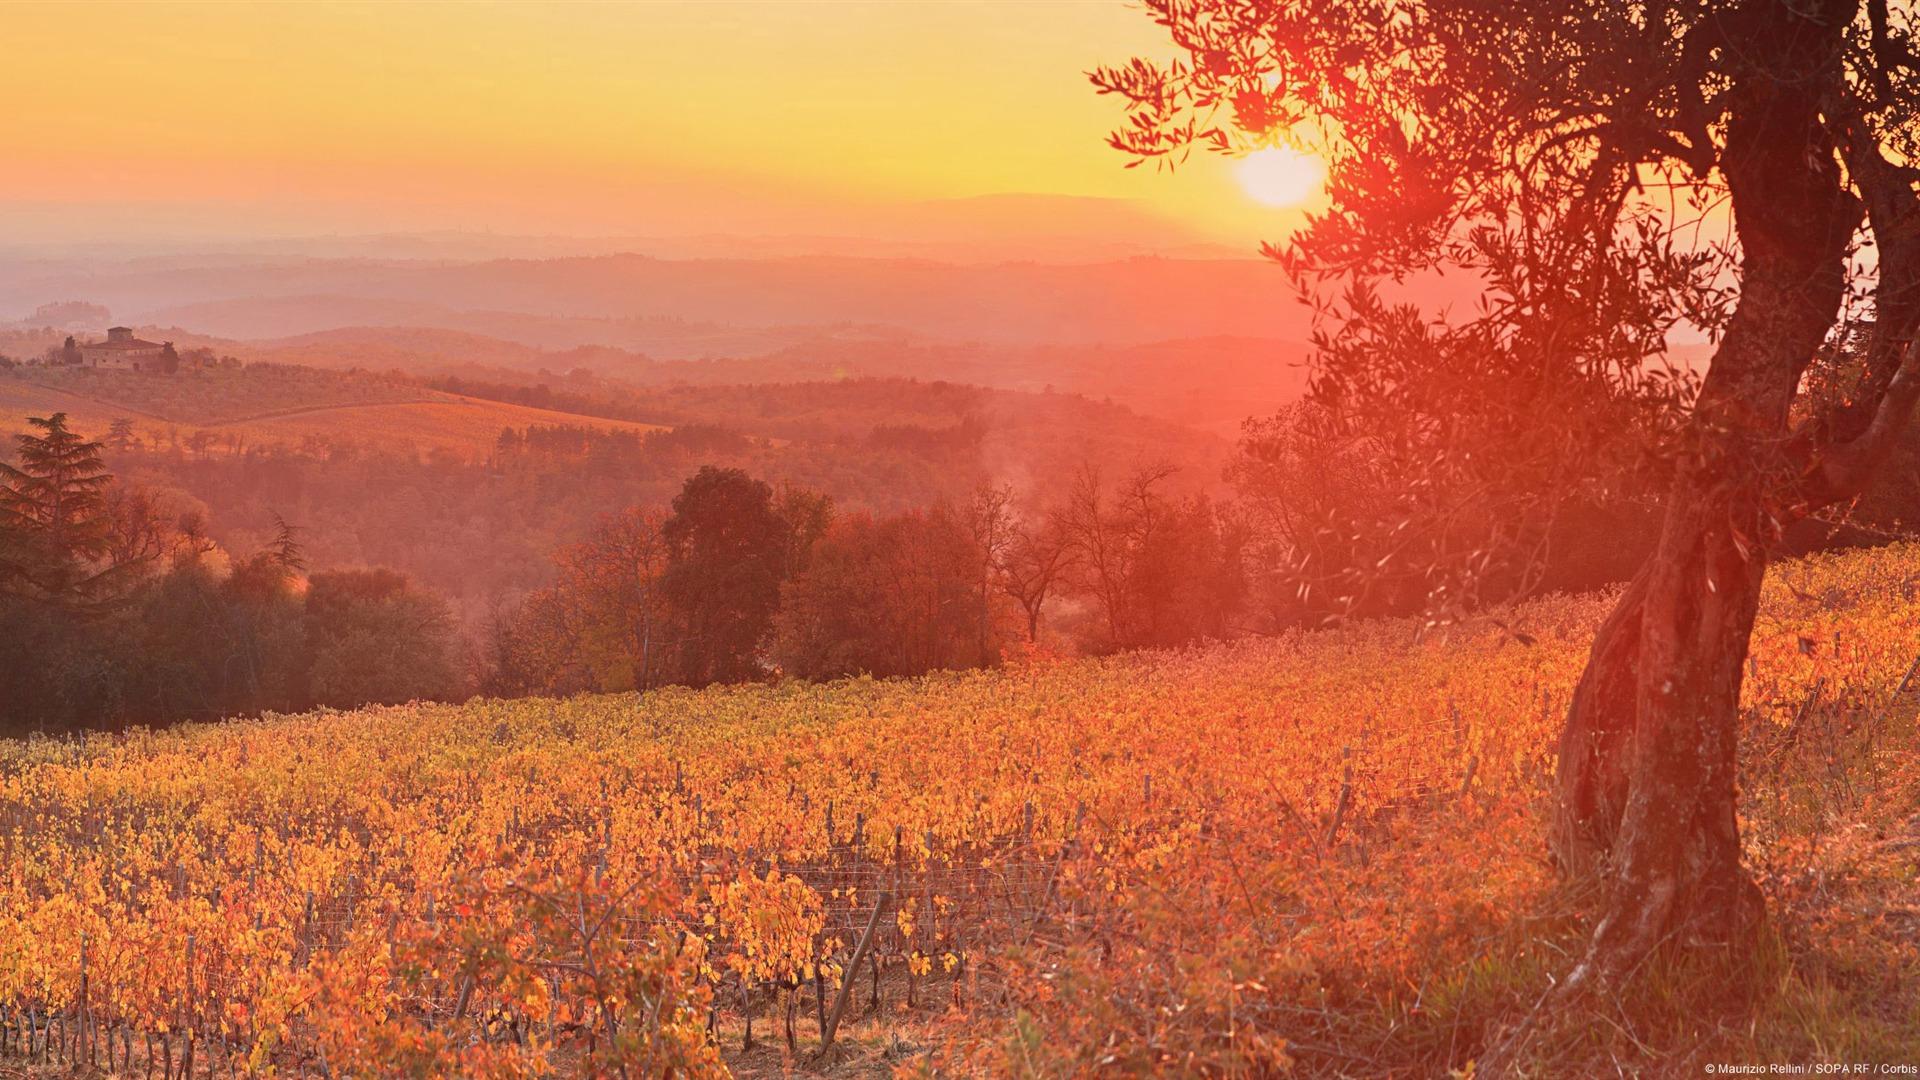 Tuscan Vineyard Sunset-Windows 10 HD Wallpaper Preview ...